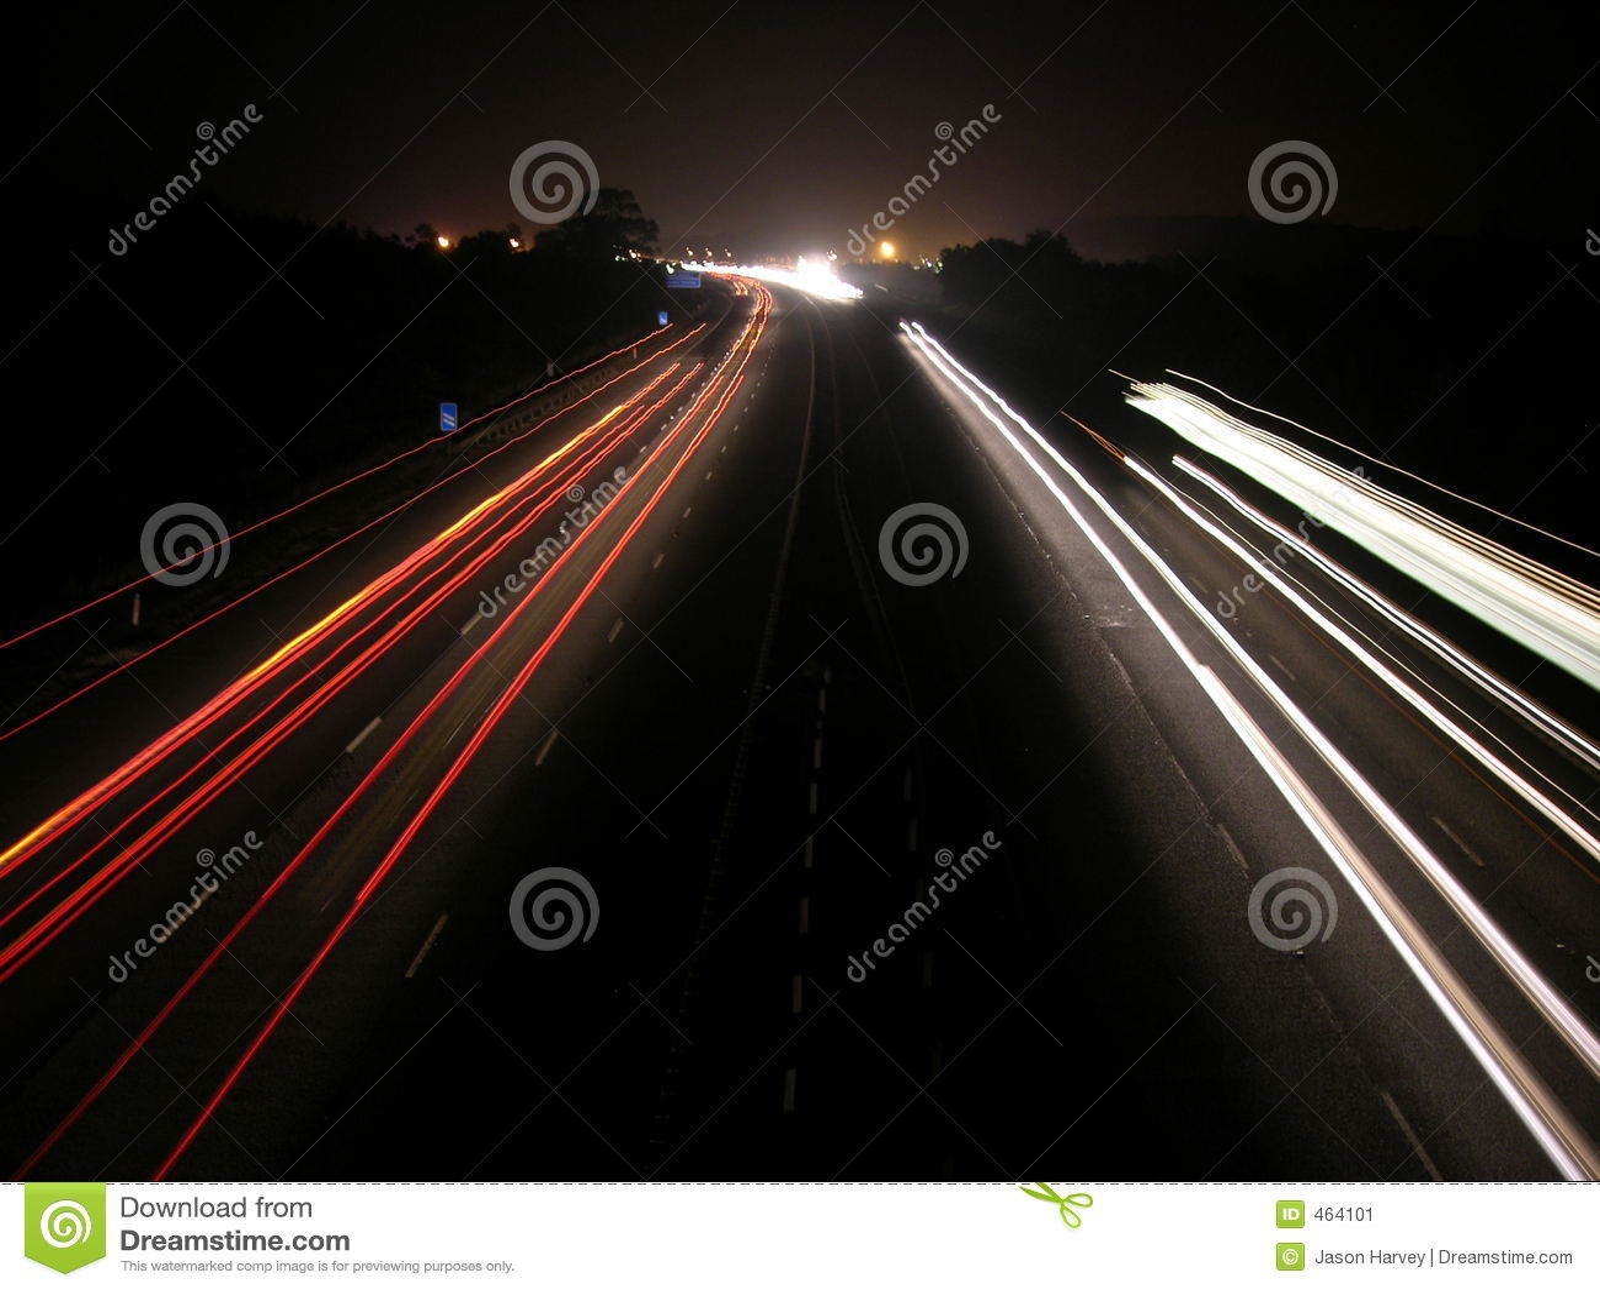 Download Light Trails stock image. Image of motorway, tail, dark - 464101